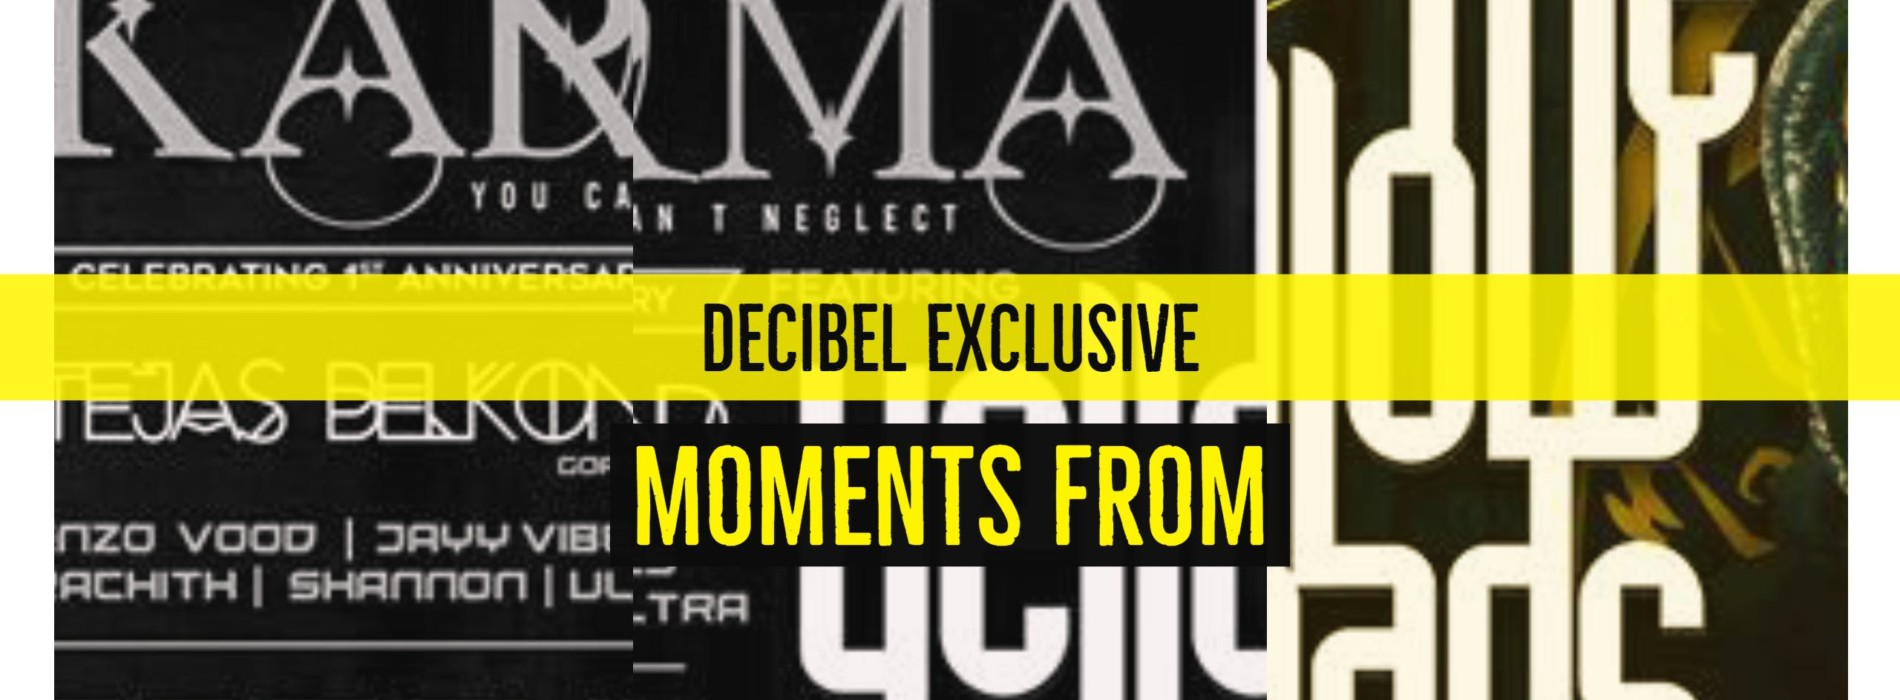 Decibel Exclusive : KÁRMÁ Ft The YellowHeads